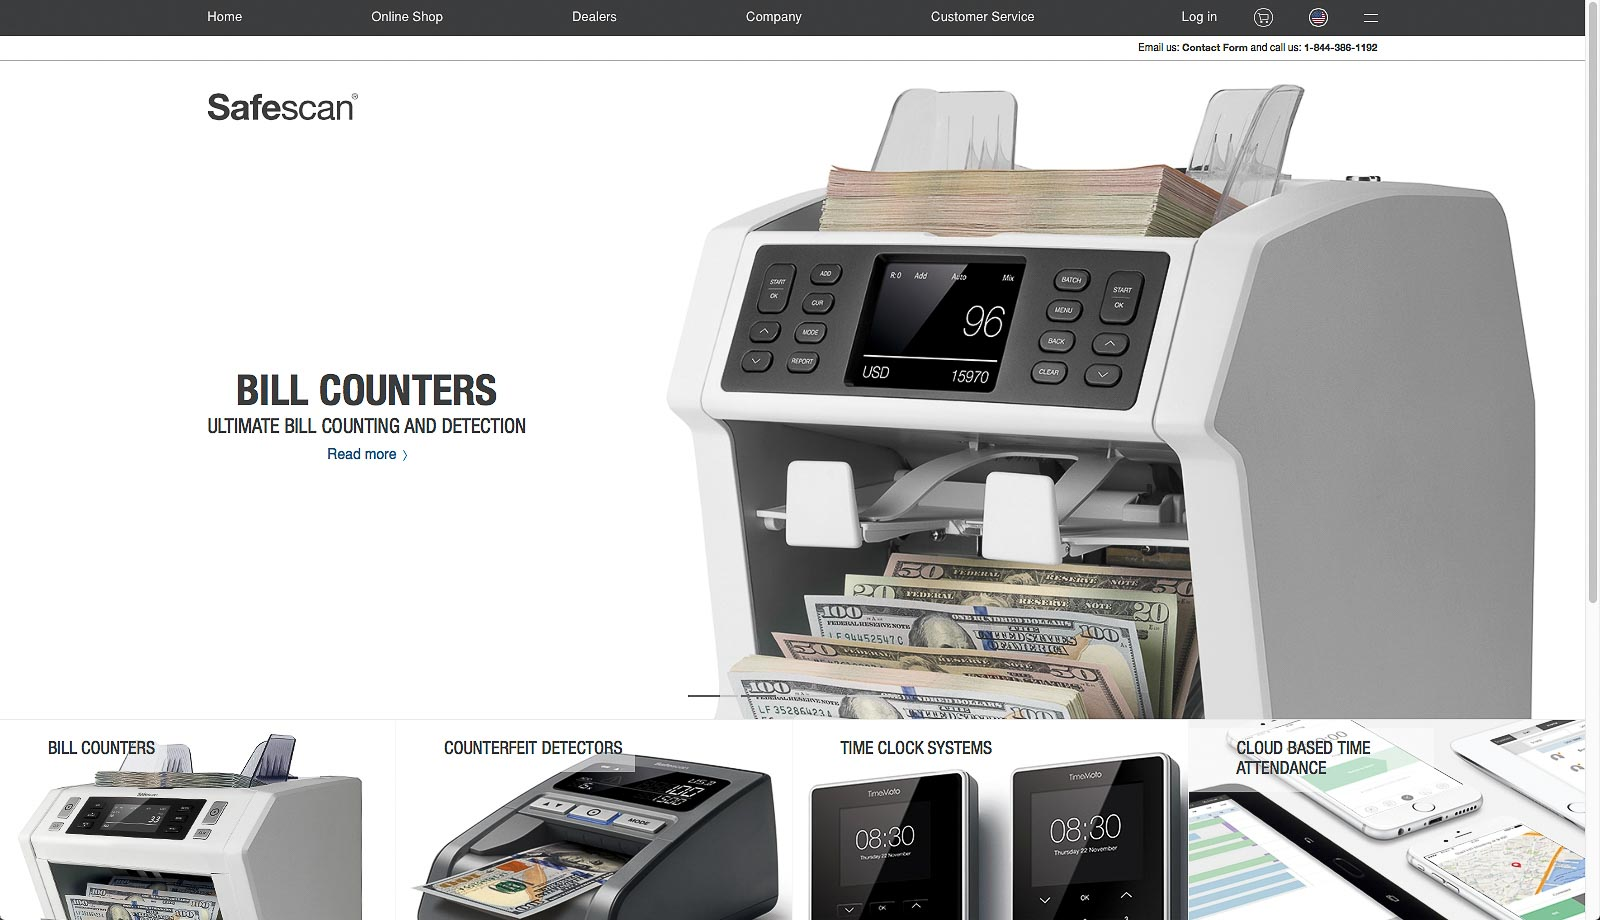 productfotografie product fotografie packshot productfoto webshop